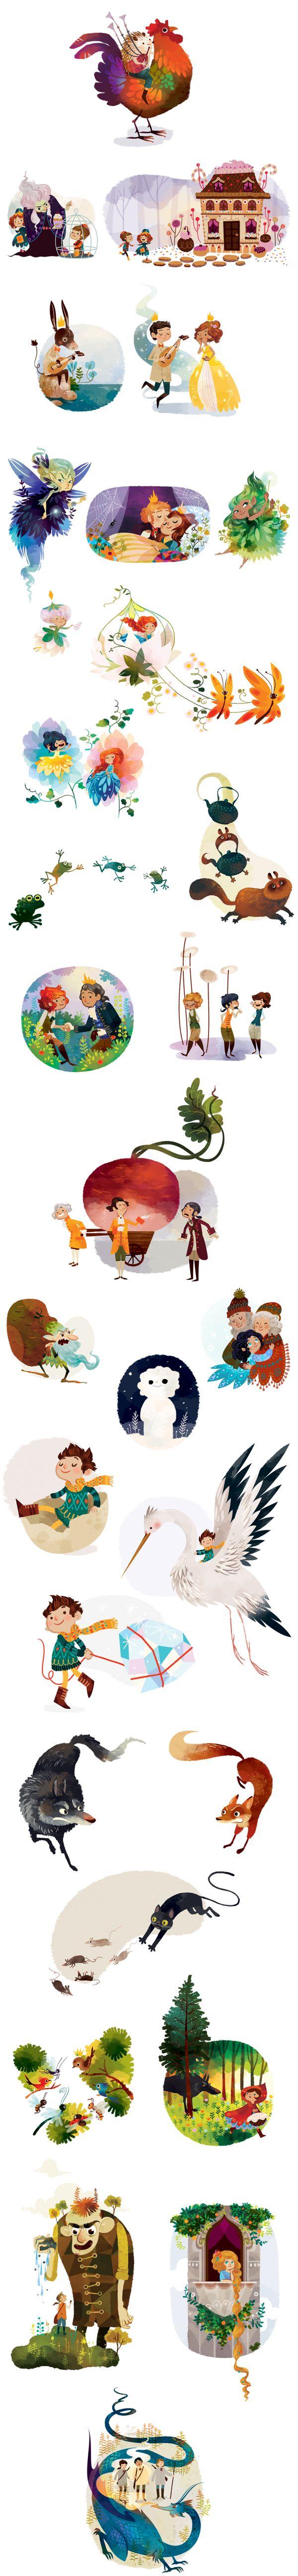 Fairy Tales by Lorena Alvarez Gómez, via Behance